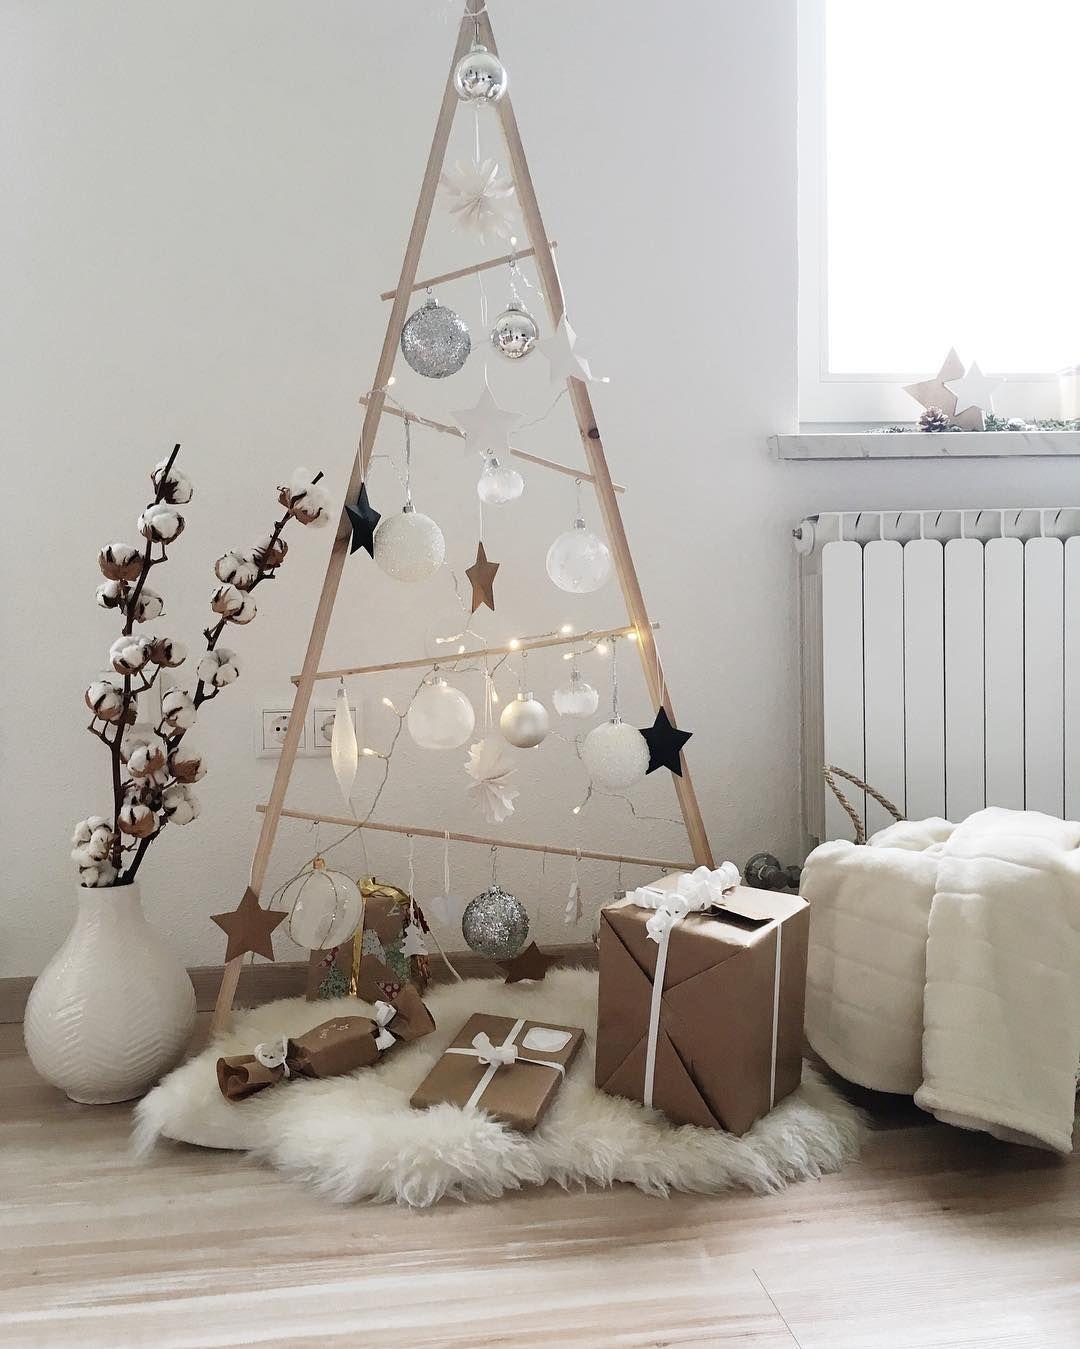 Modern Nordic Christmas Decorating Ideas   POPSUGAR Home Australia & Modern Nordic Christmas Decorating Ideas   POPSUGAR Home Australia ...